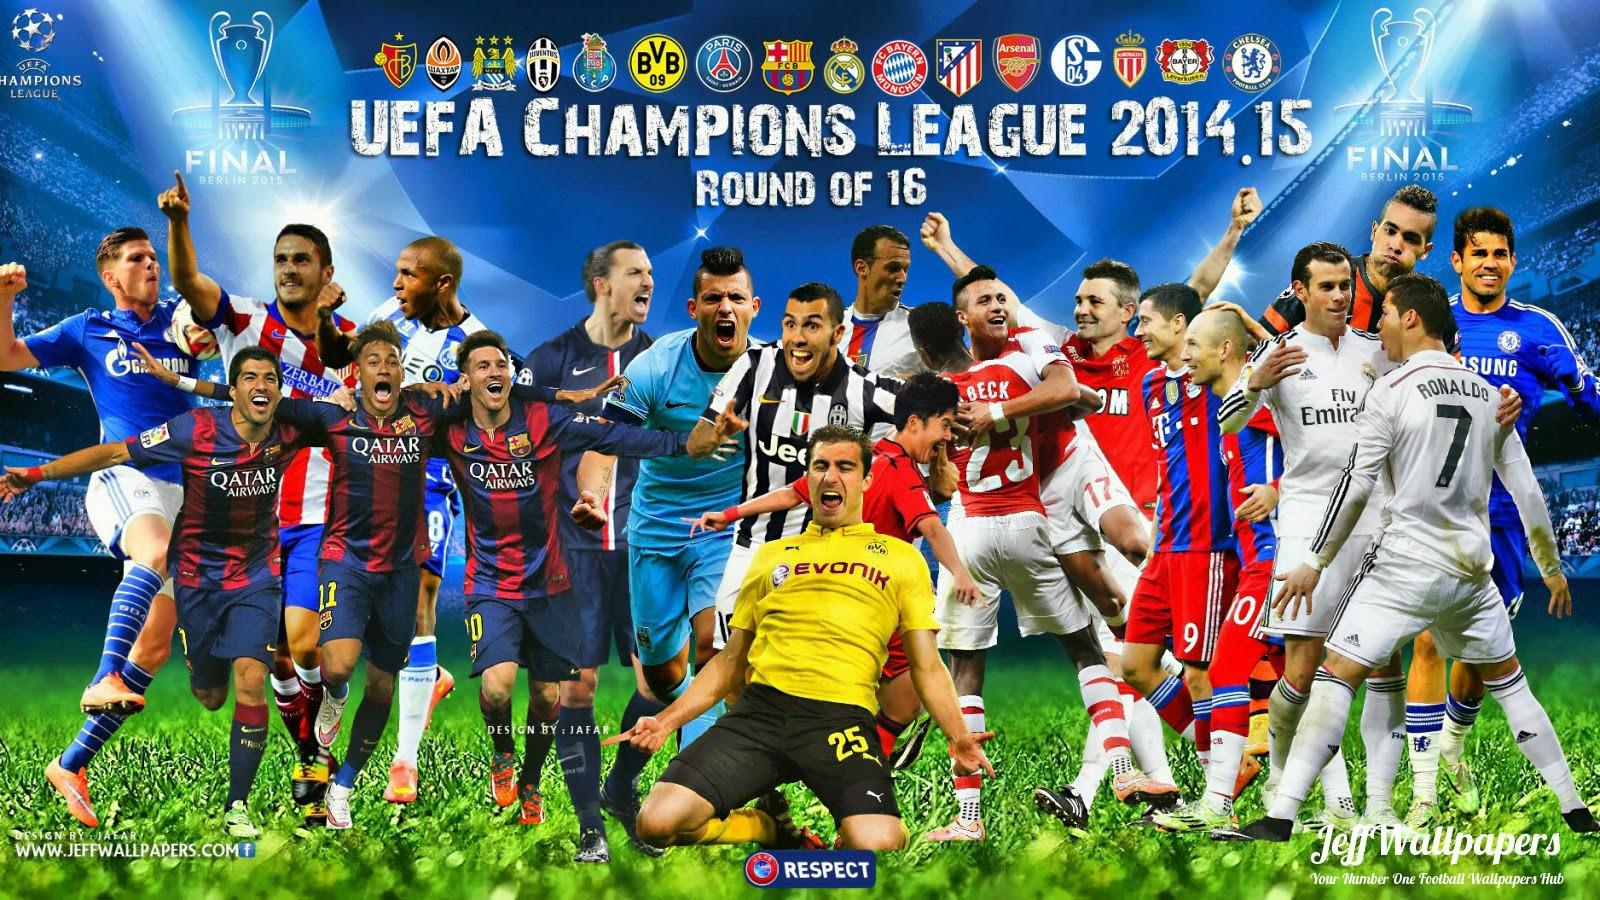 Champions League Final Horario 2015